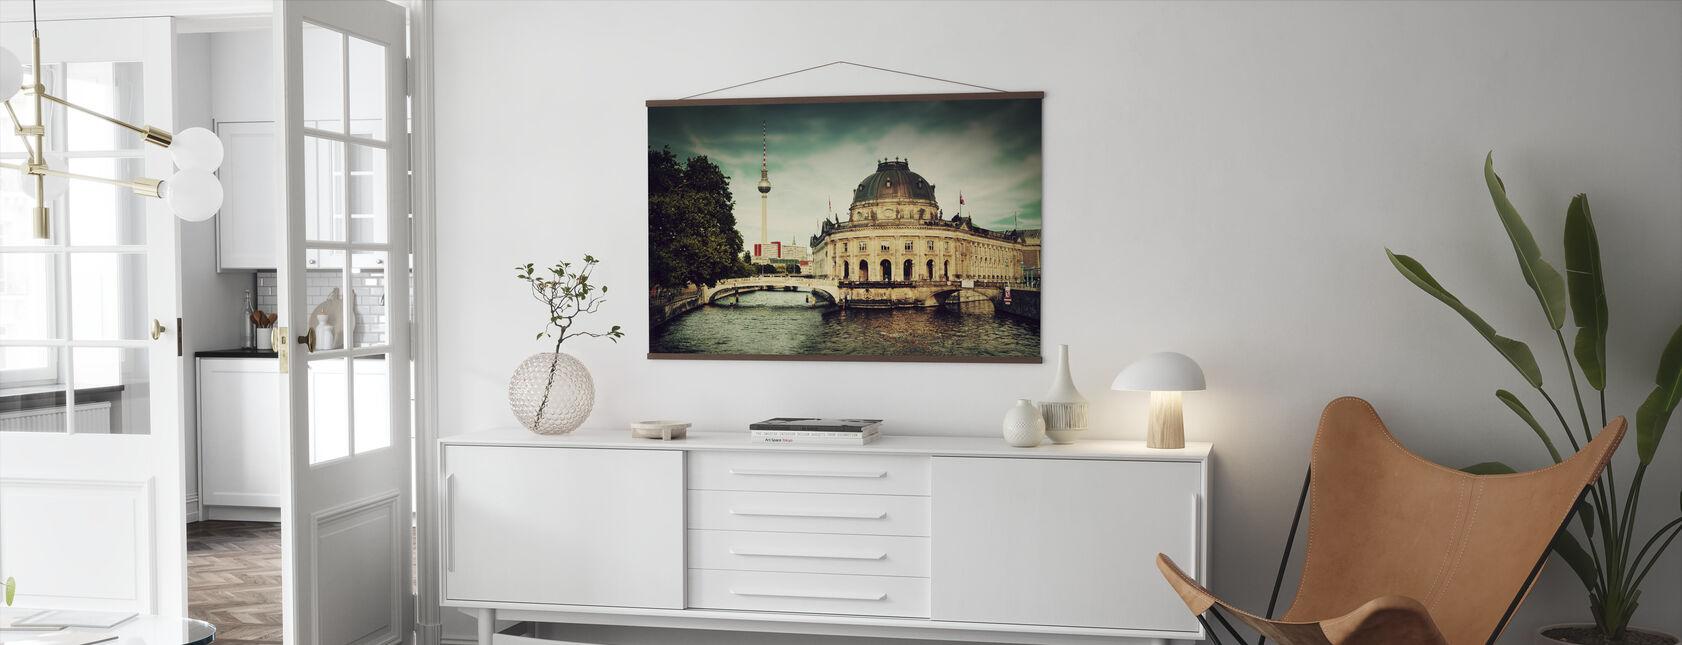 The Bode Museum in Berlin - Poster - Living Room